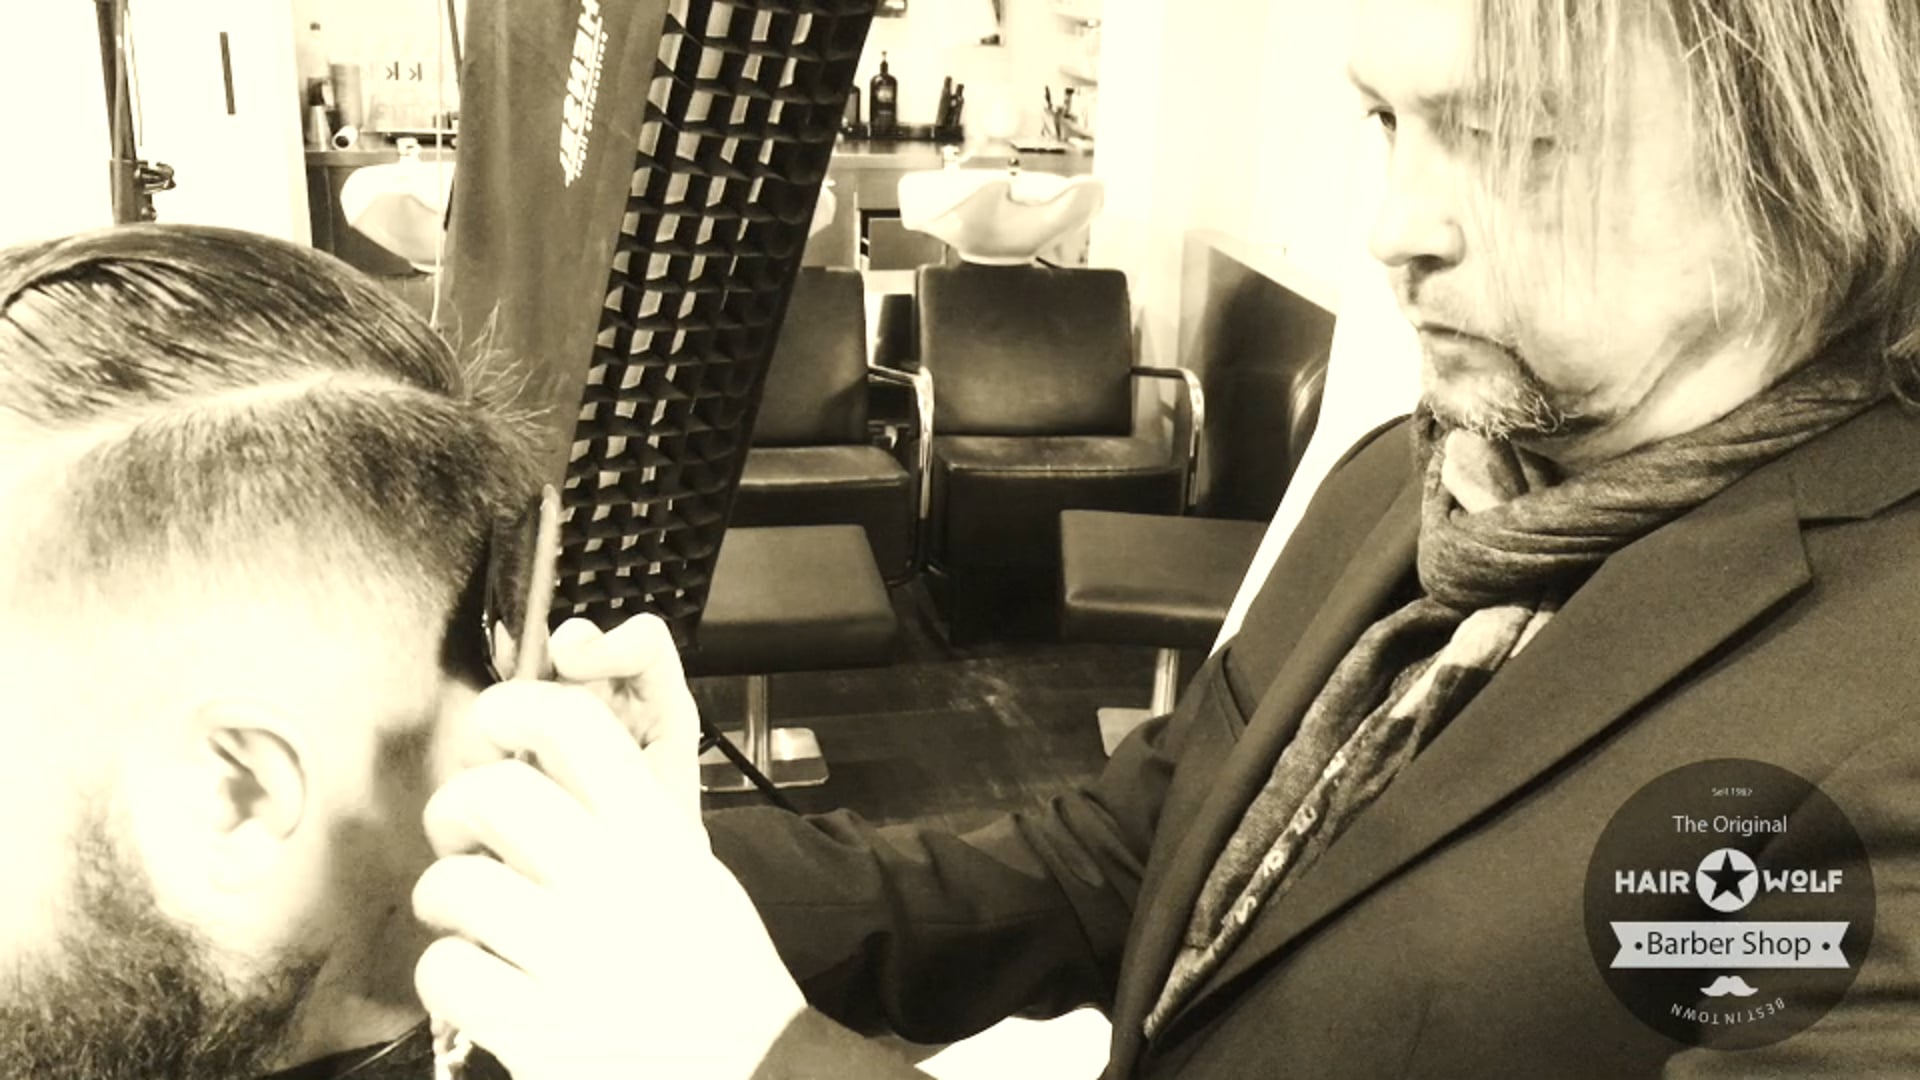 Barber Shop, Hair Wolf